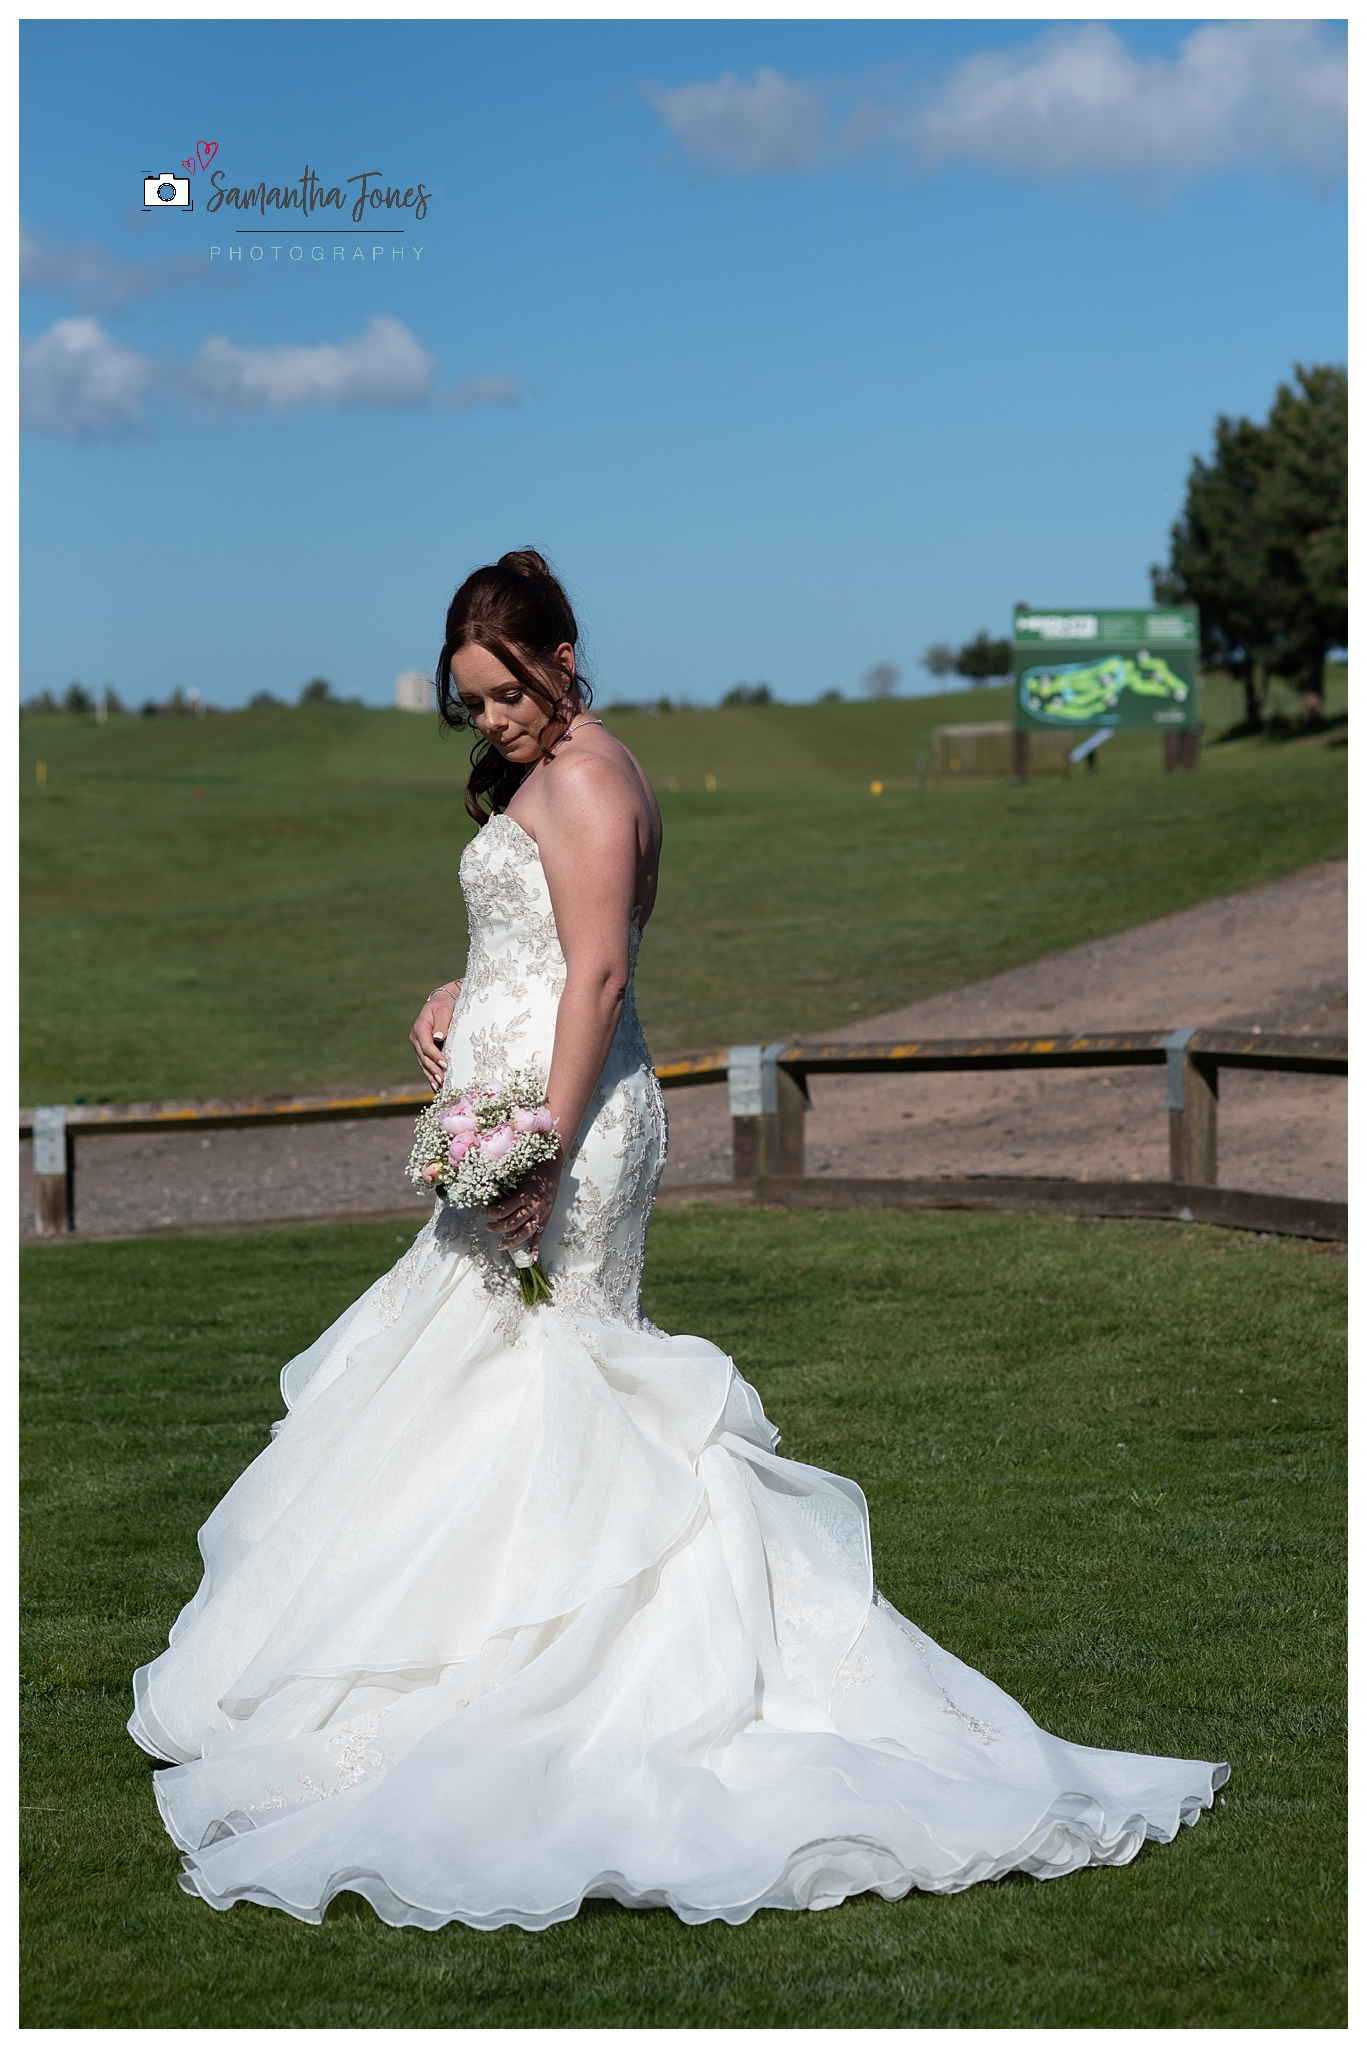 Emma and Aaron twilight wedding at Stonelees bridal portrait